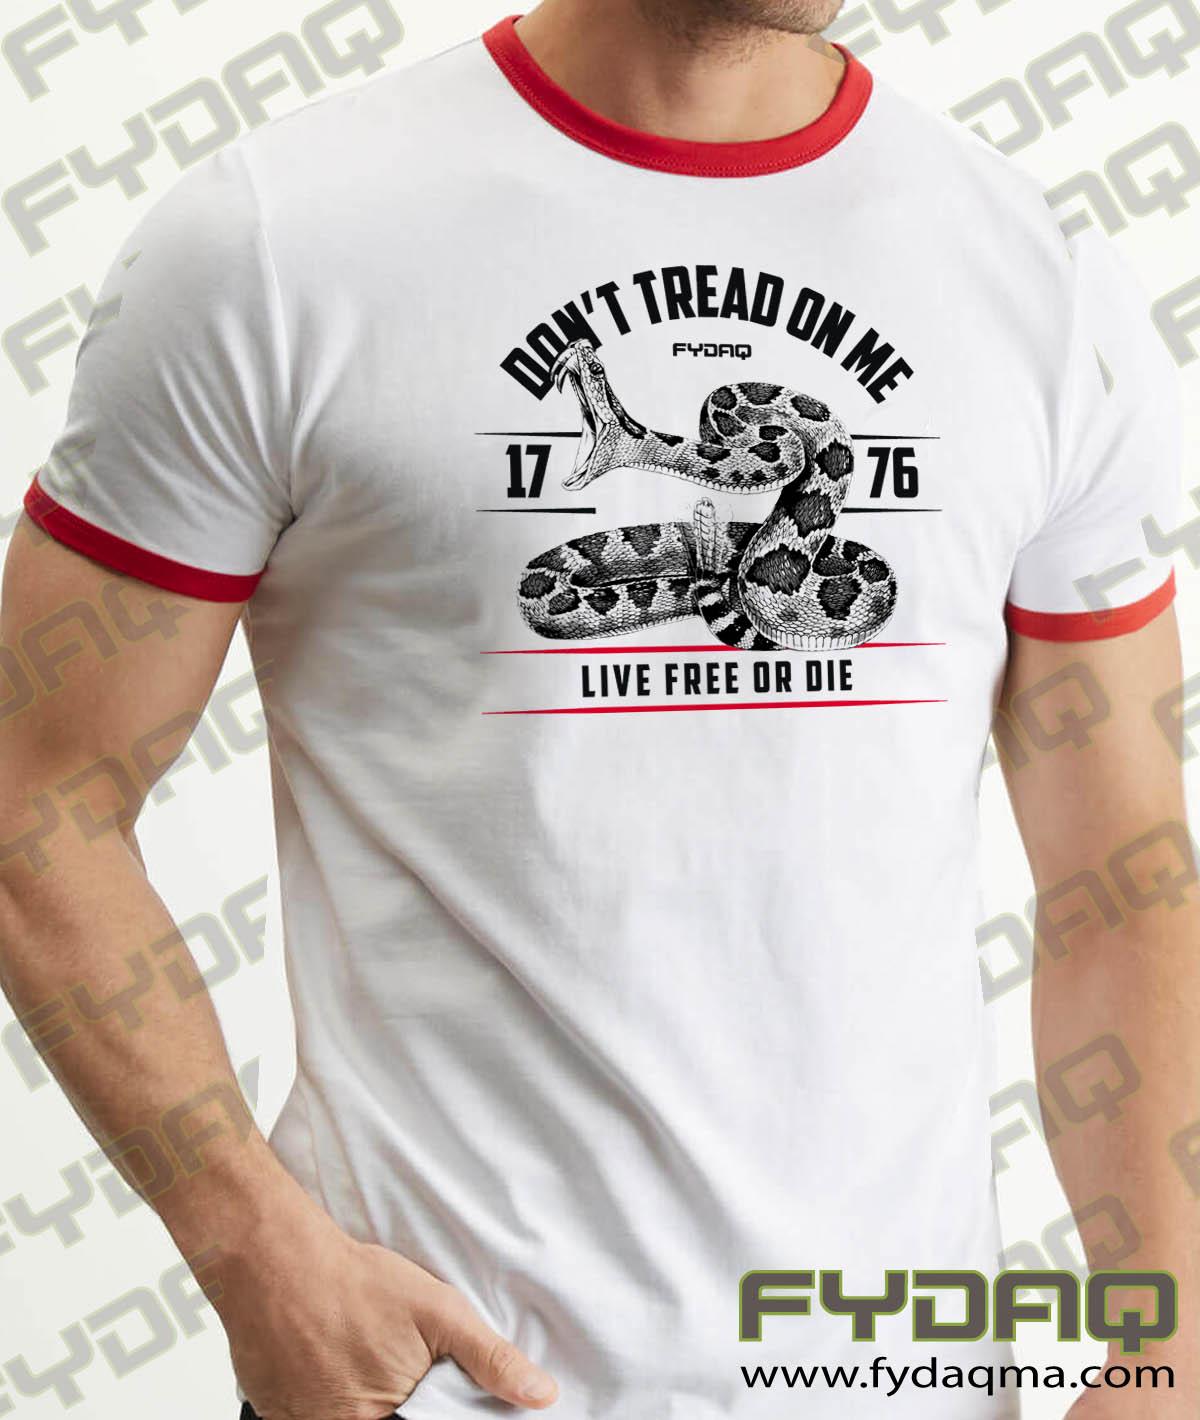 dont-tread-on-me-ringer-white-red-tshirt-FYDAQ